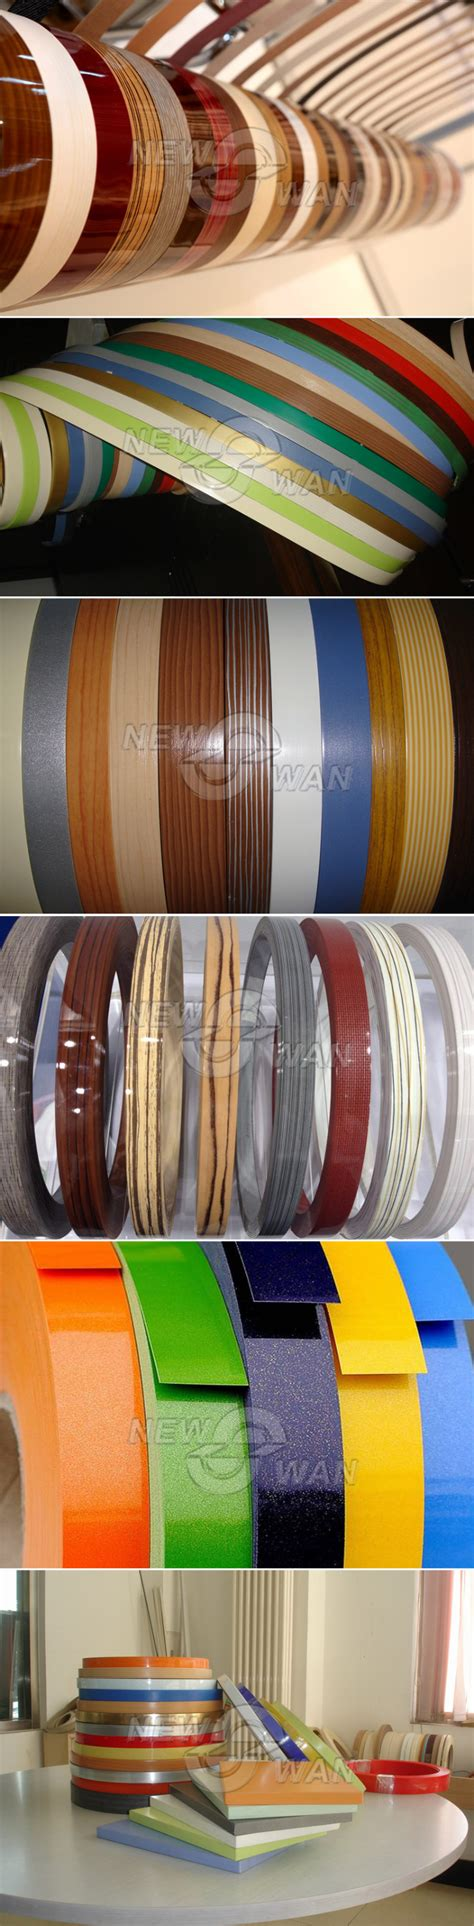 self adhesive cabinet edging tape pvc adhesive edge banding tape for mdf furniture kitchen